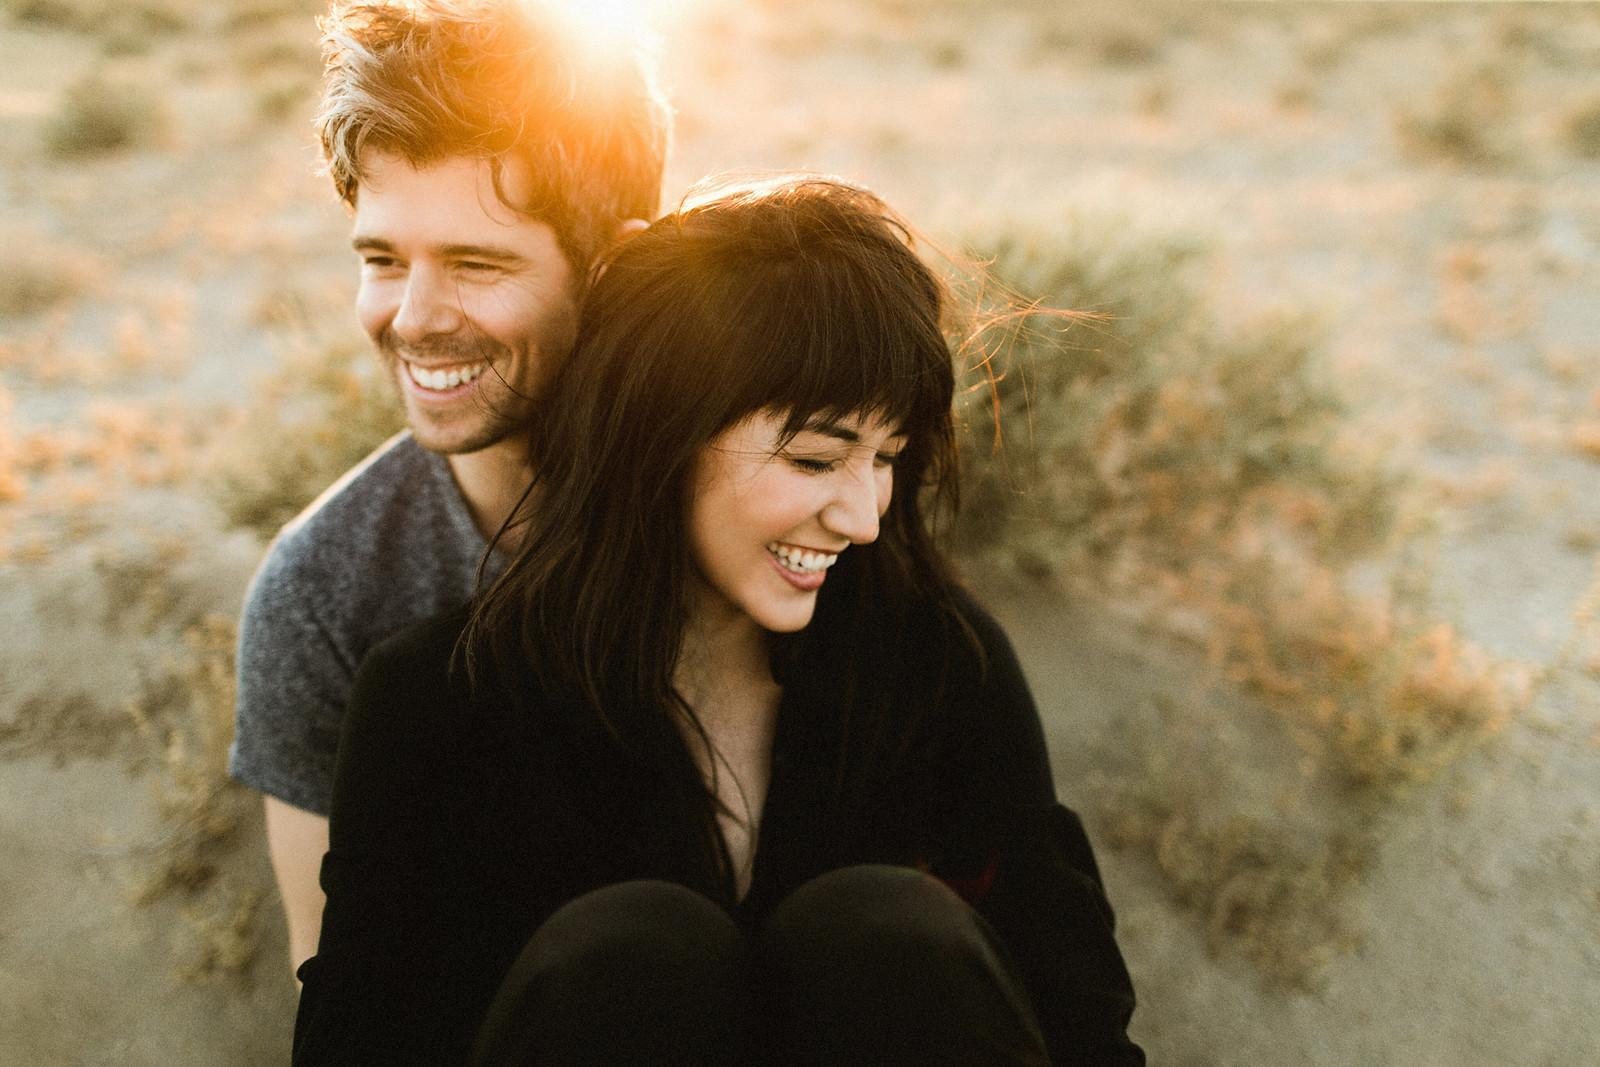 El Mirage Dry Lake Bed Couple Shoot // Ben Sasso